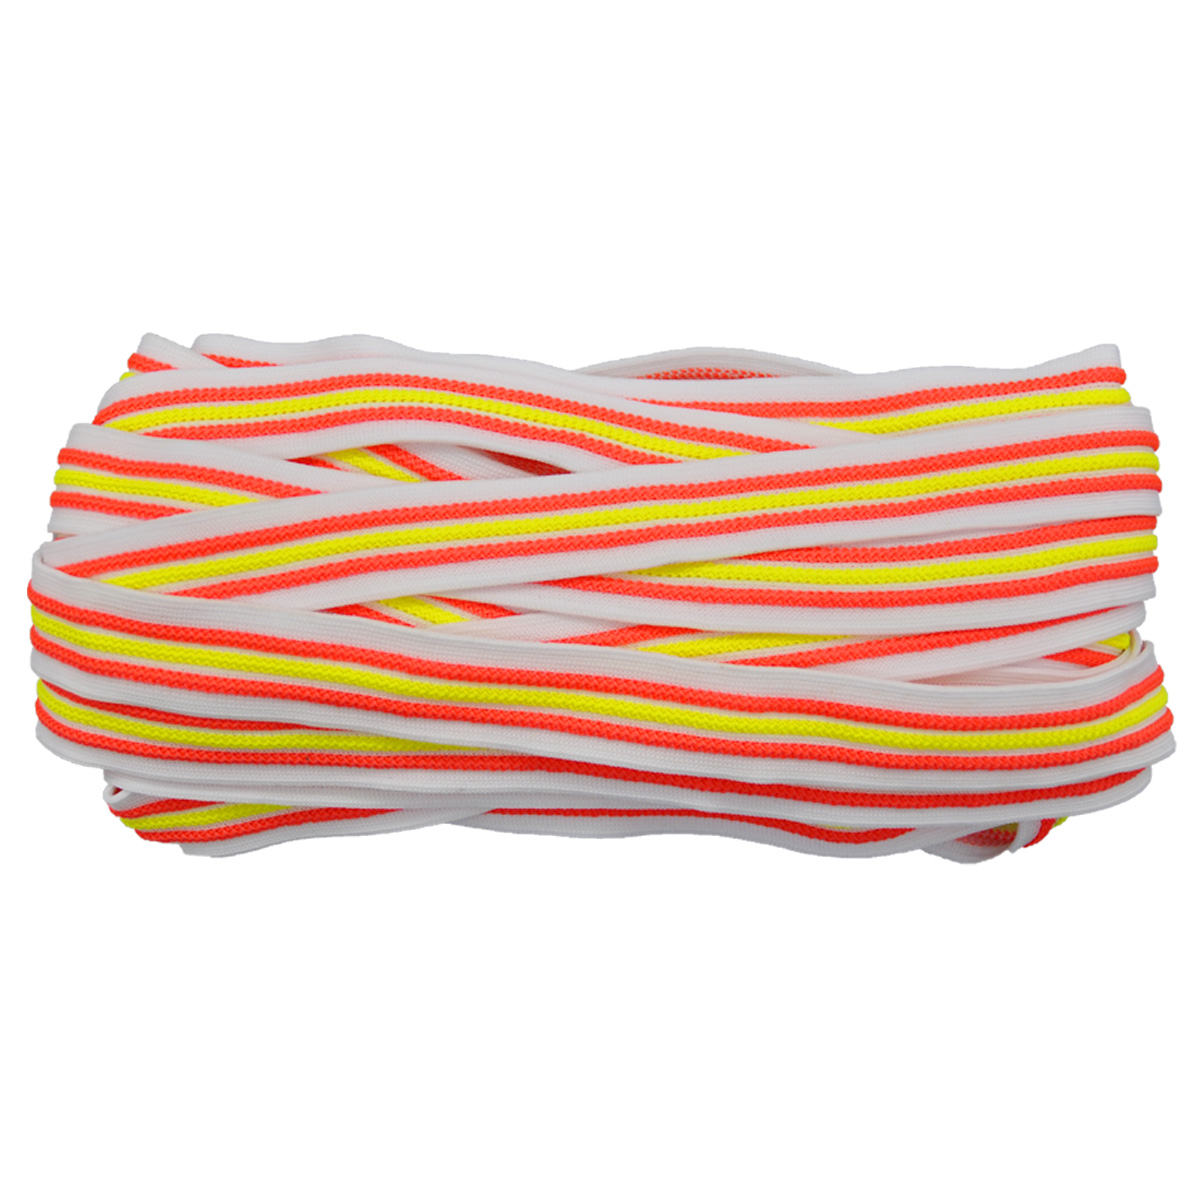 Лента лампасная №99 белый/оранжевый/желтый 2см уп*10м, 2135001348344